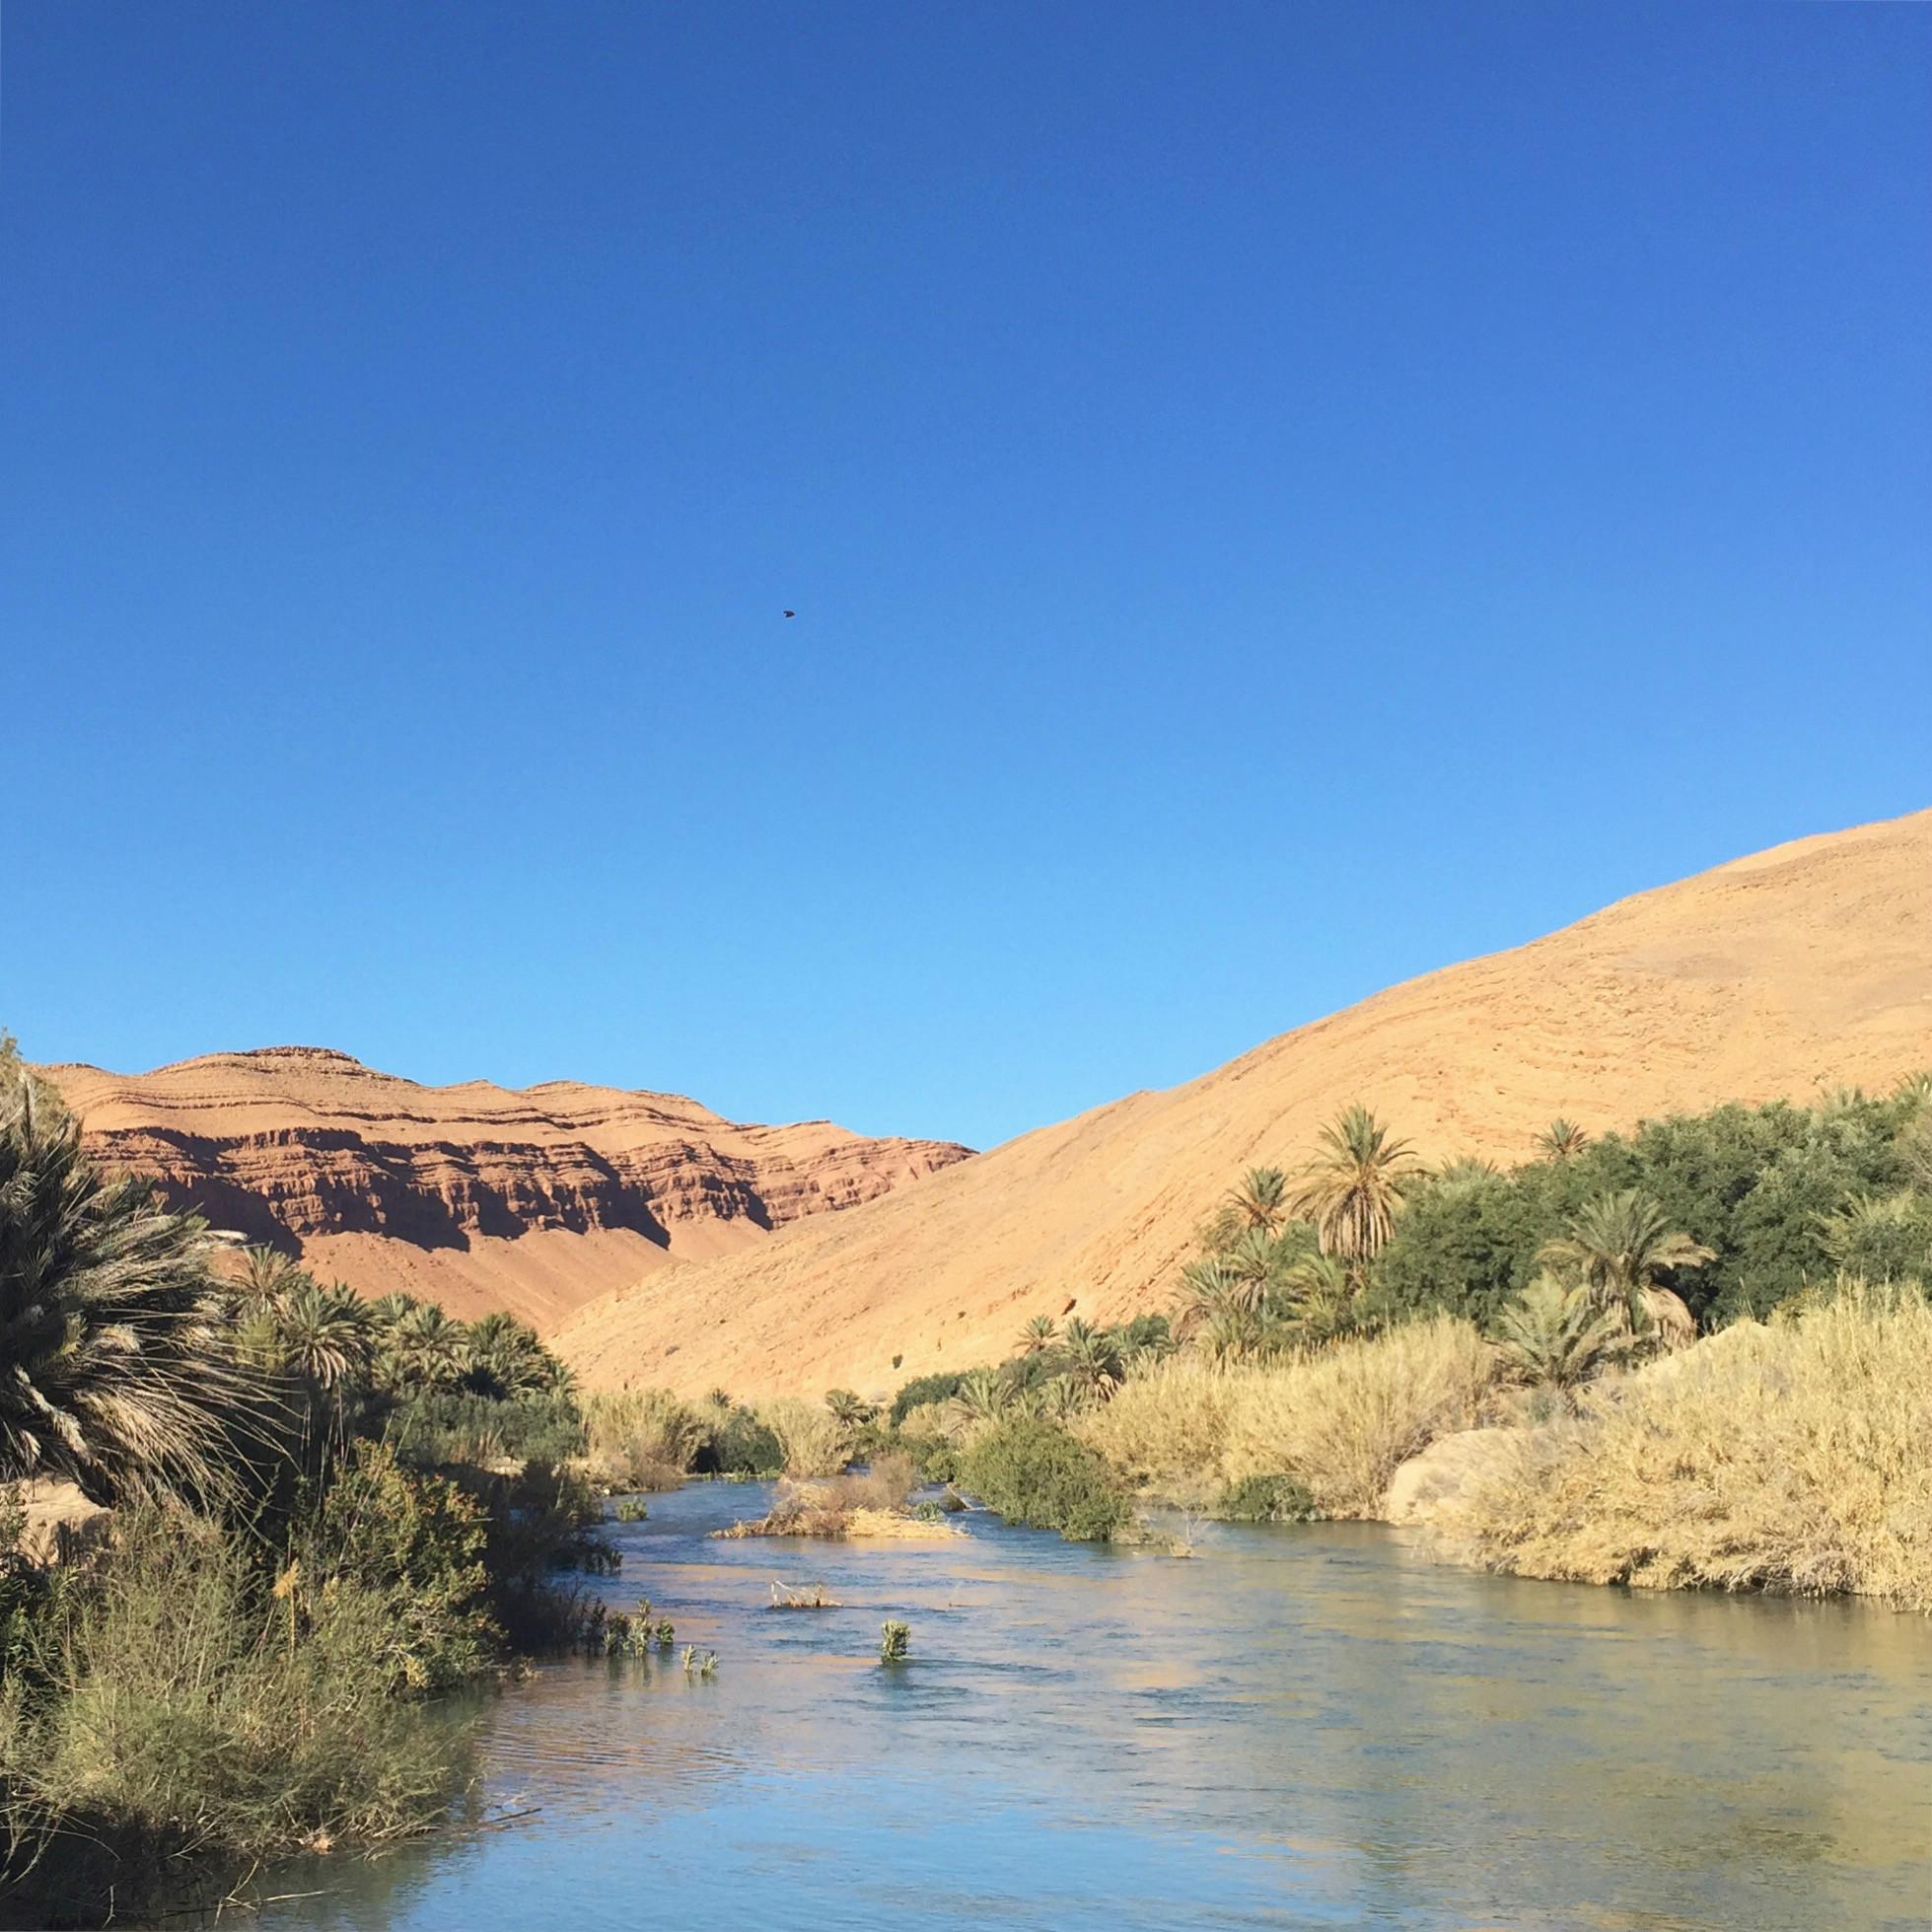 barrage Maroc oasis route de Midelt